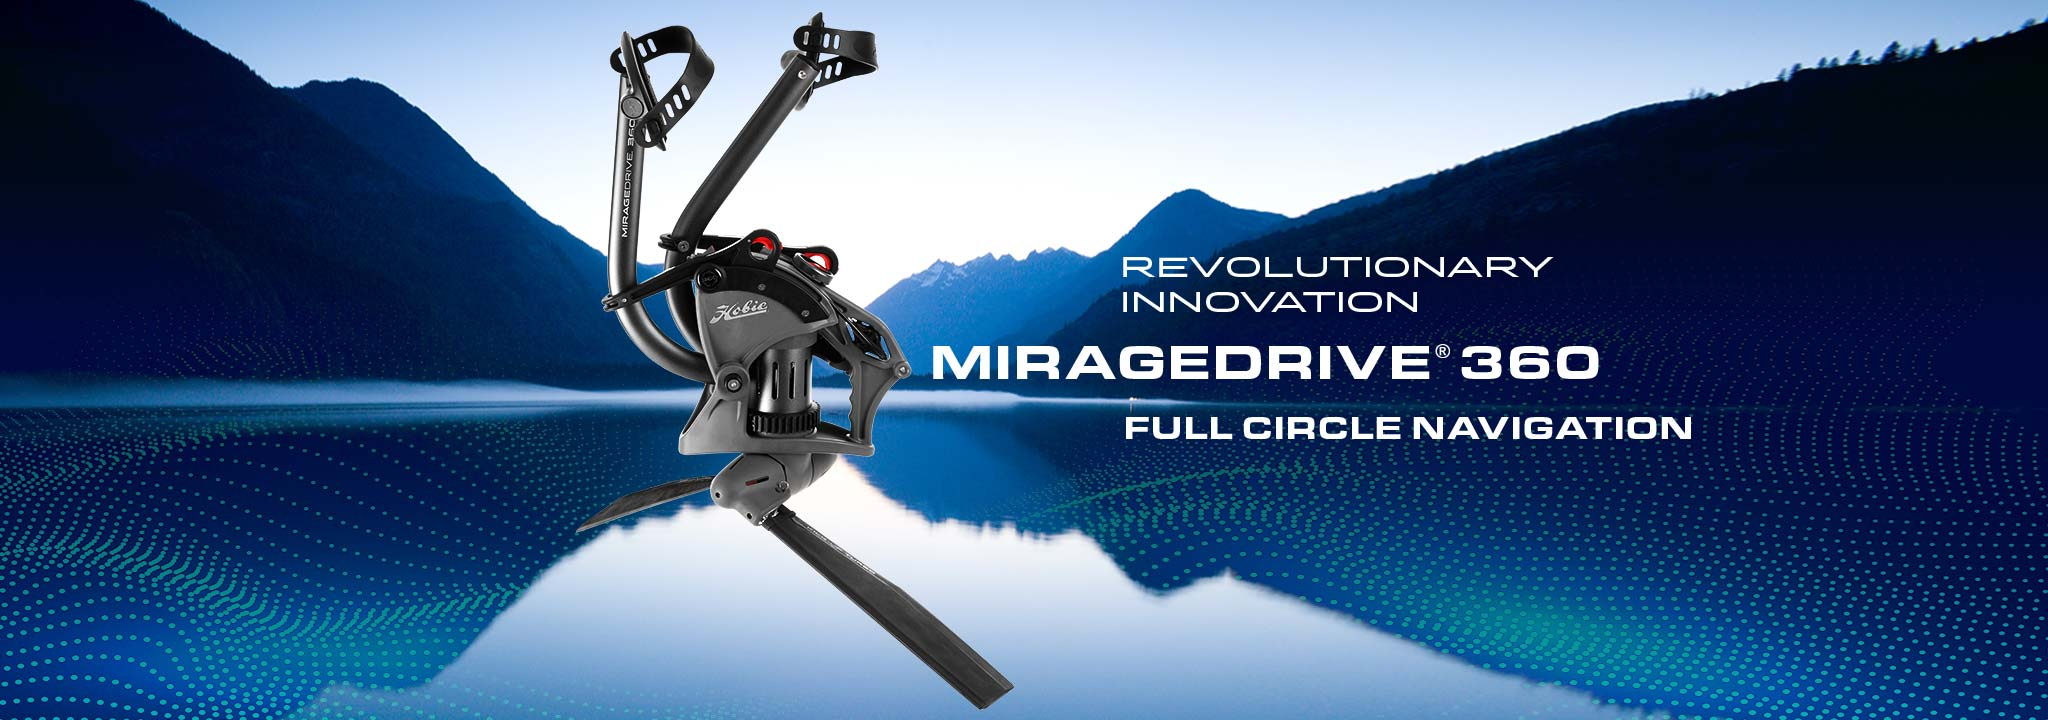 MirageDrive 360